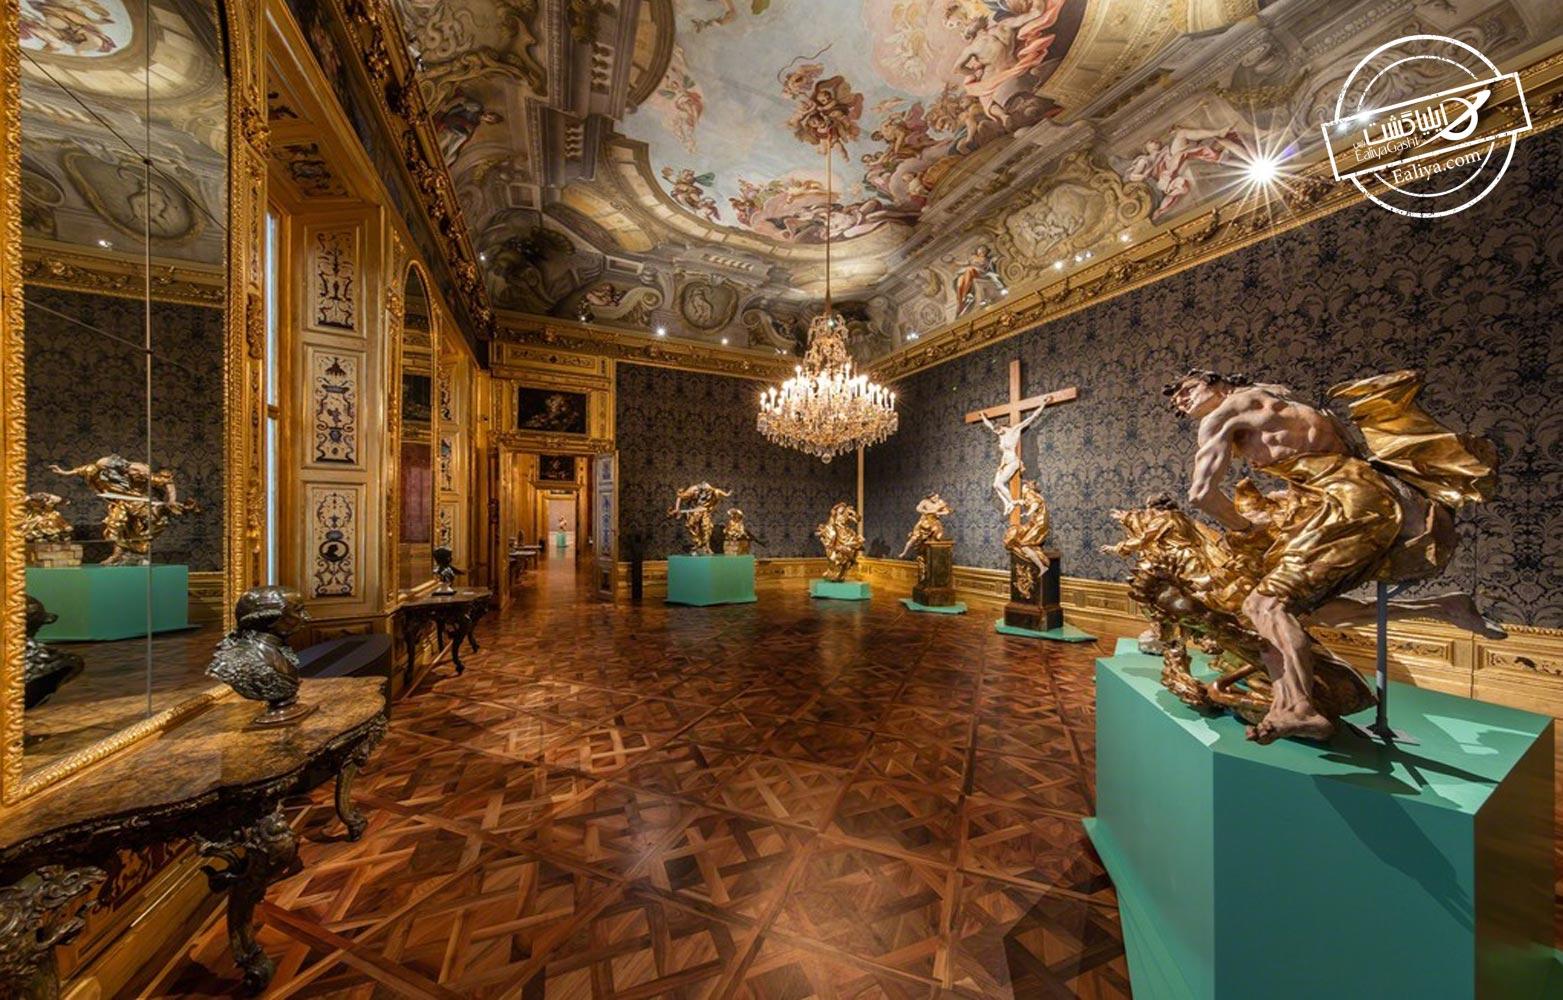 موزه کونست هیس توریشس